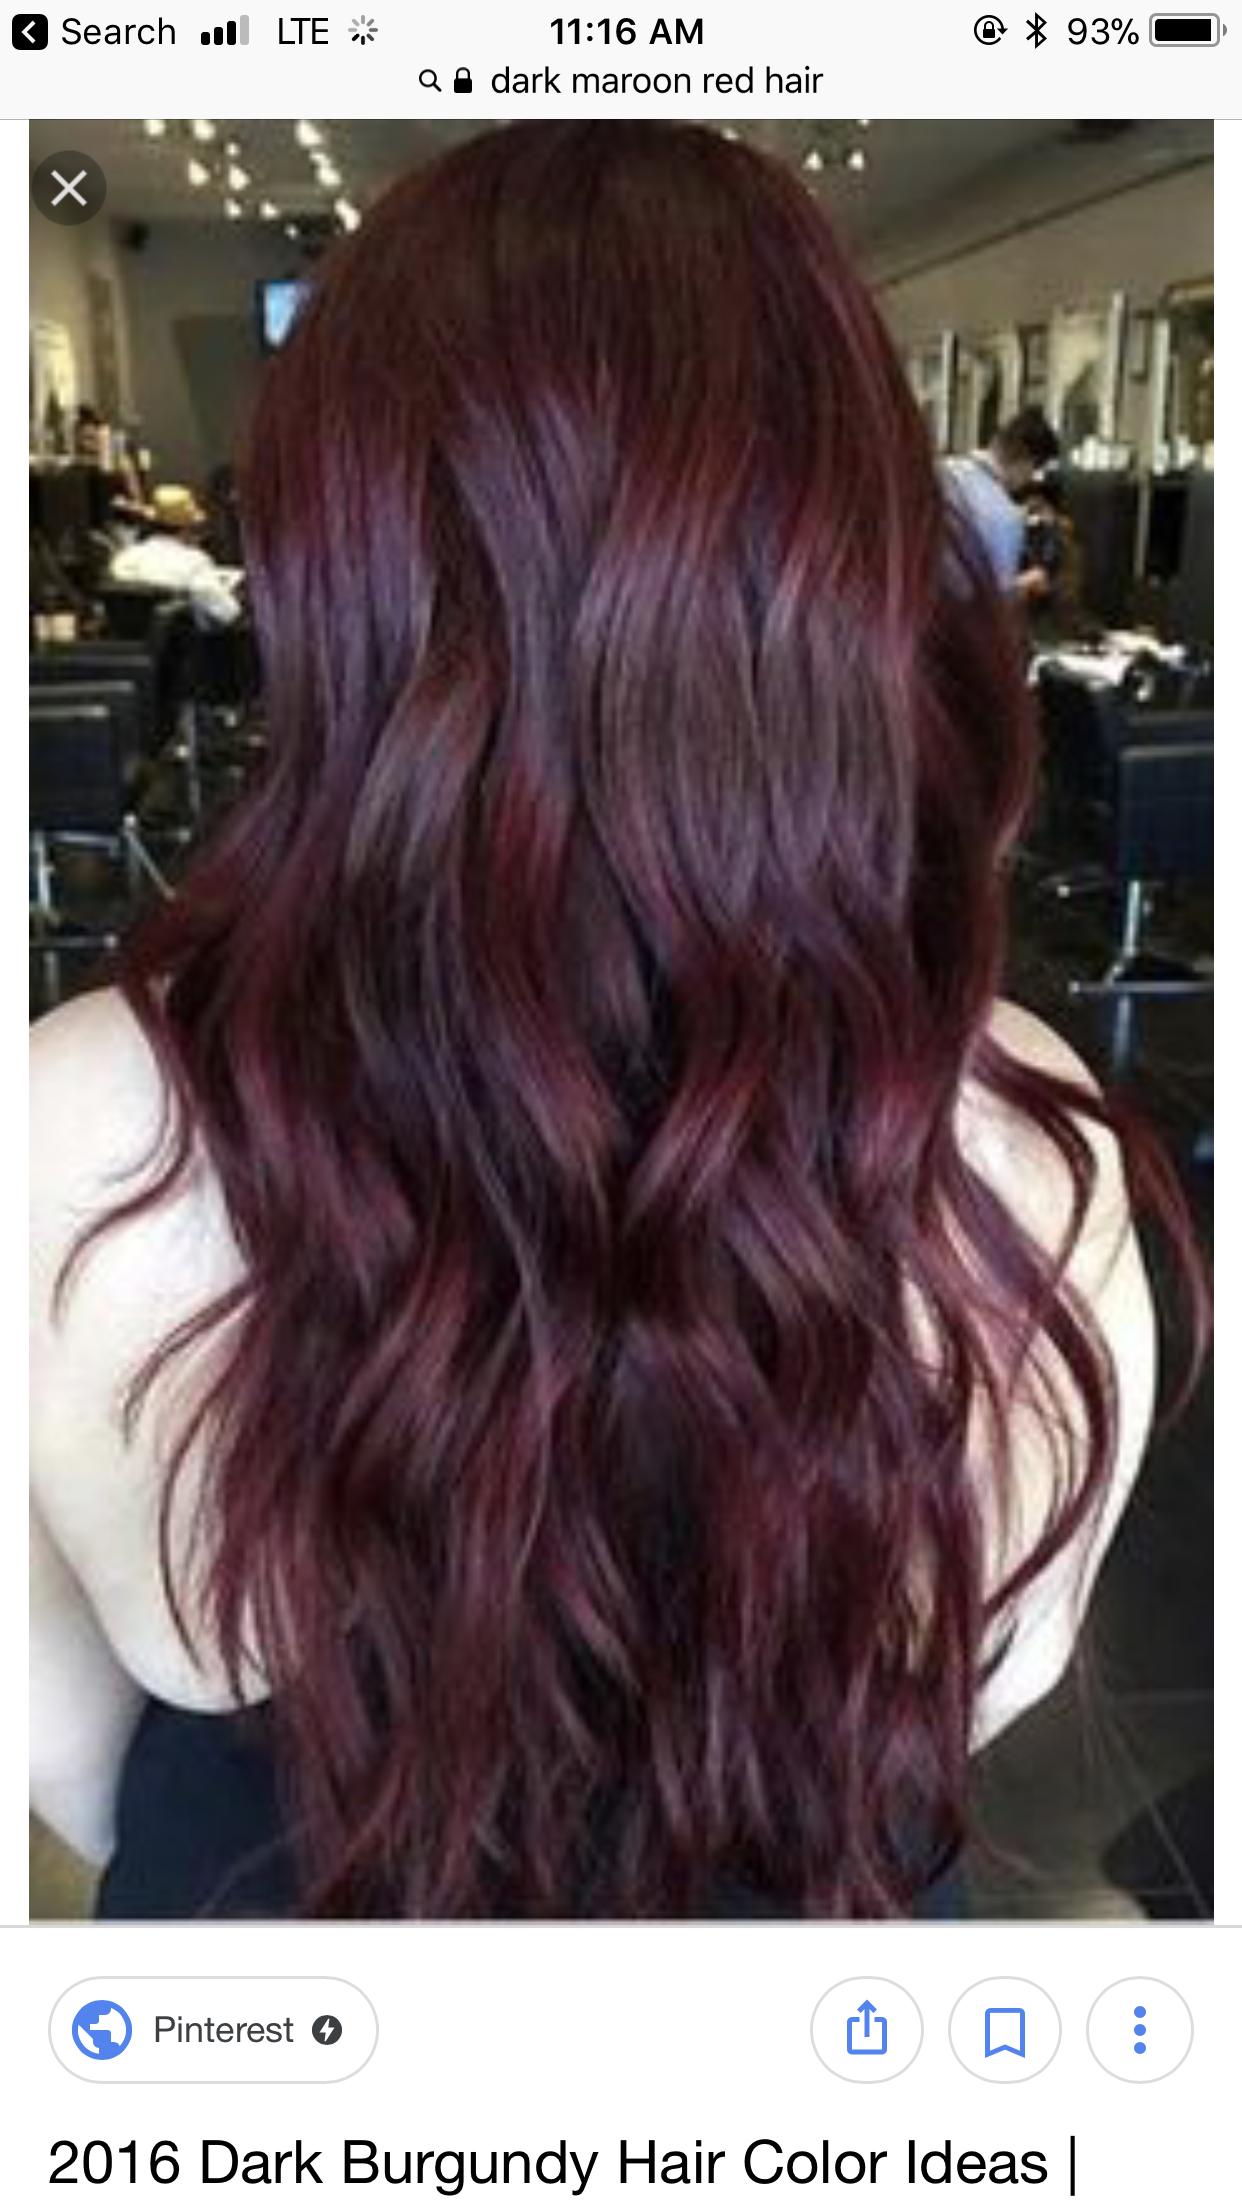 Pin By Brook Kepfer On Hair Wine Hair Hair Color Mahogany Dark Red Hair Color